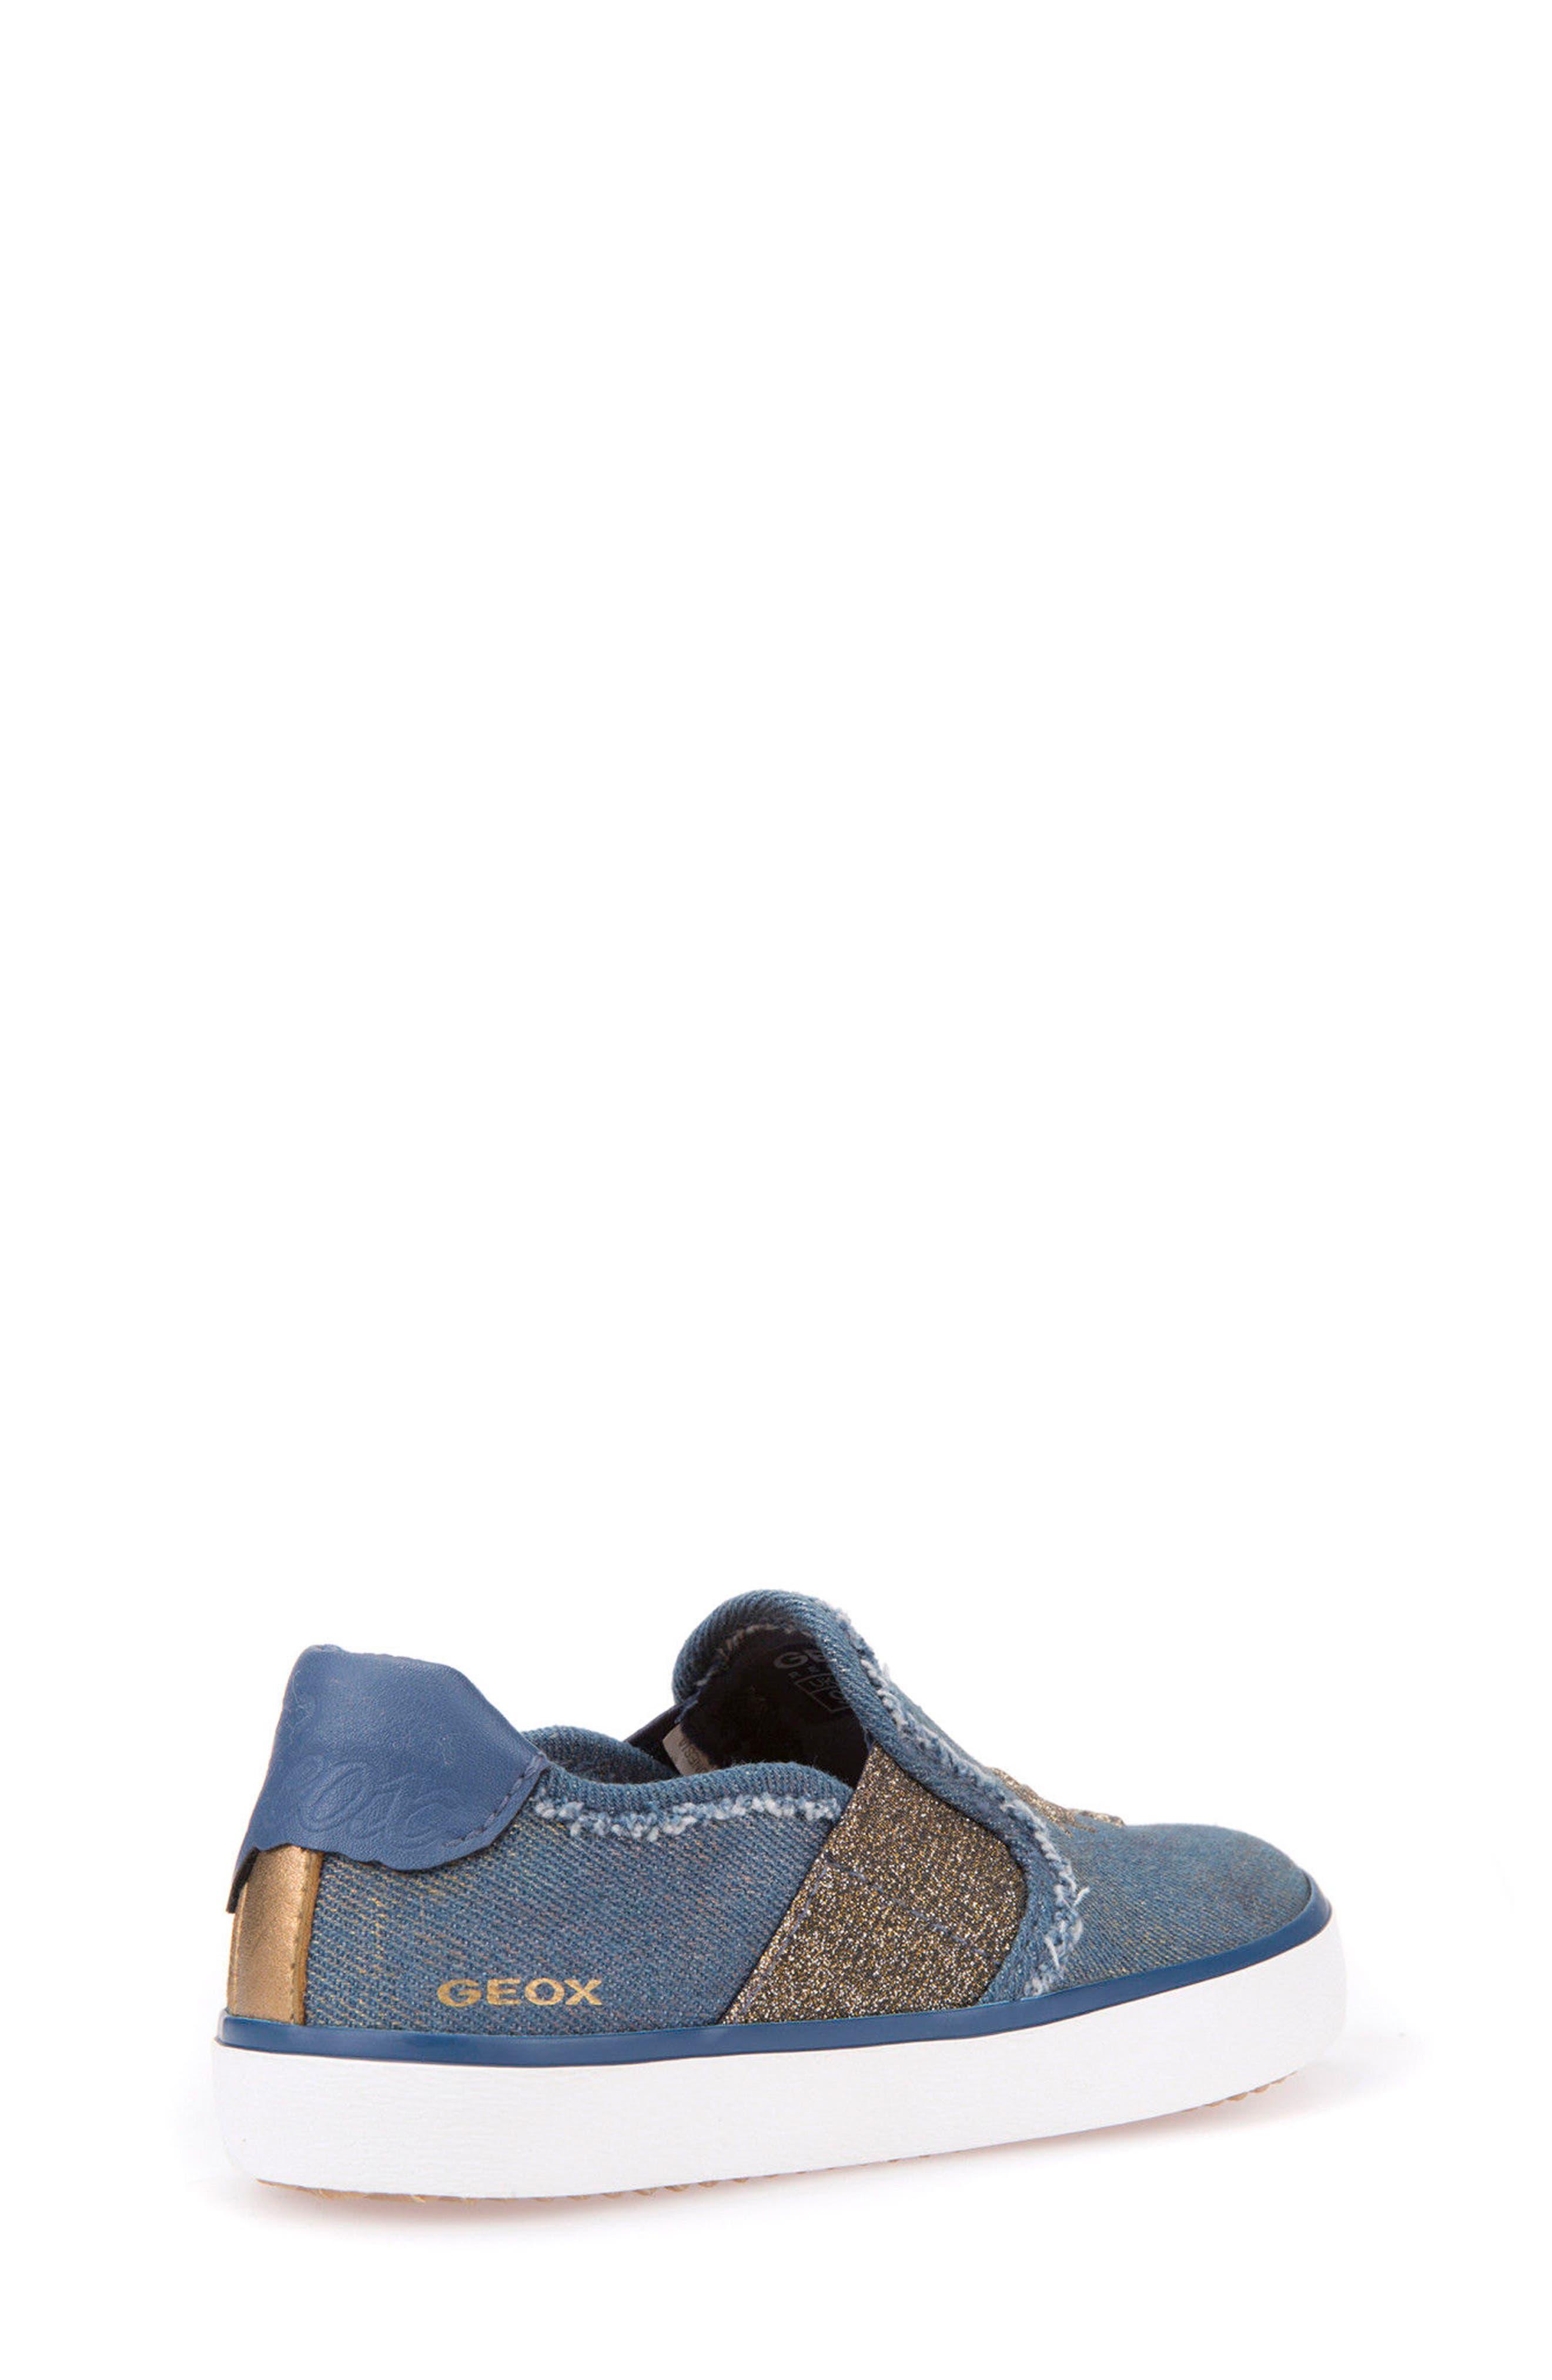 Kilwi Slip-On Sneaker,                             Alternate thumbnail 2, color,                             AVIO